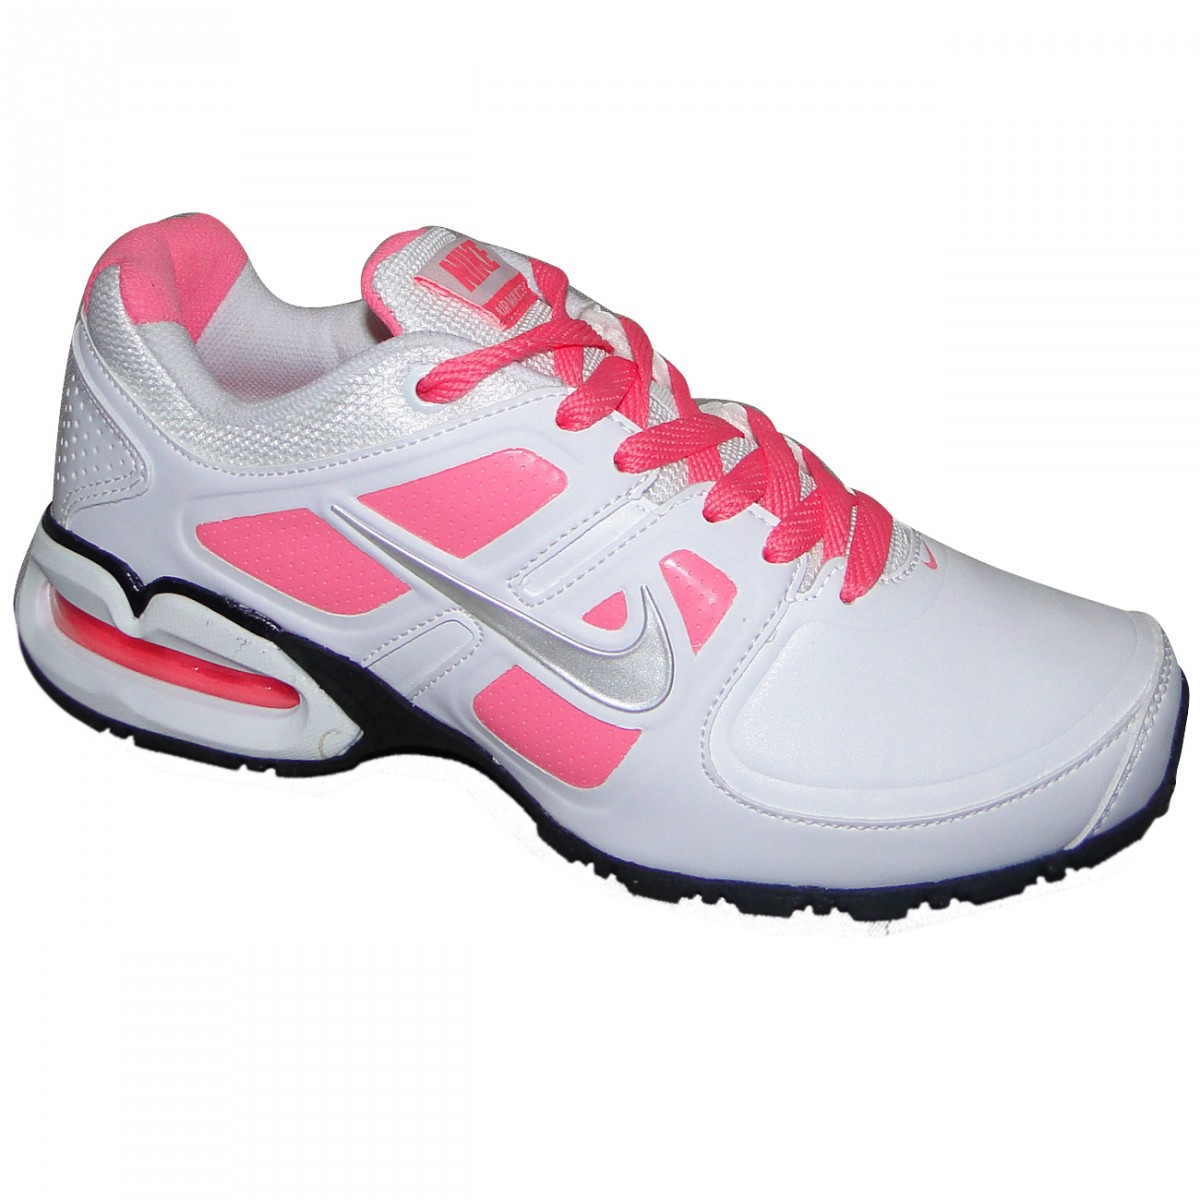 8665506ca0f Tênis Nike Air Max Lte Ii Sl 512763 105 - Branco Rosa - Chuteira Nike